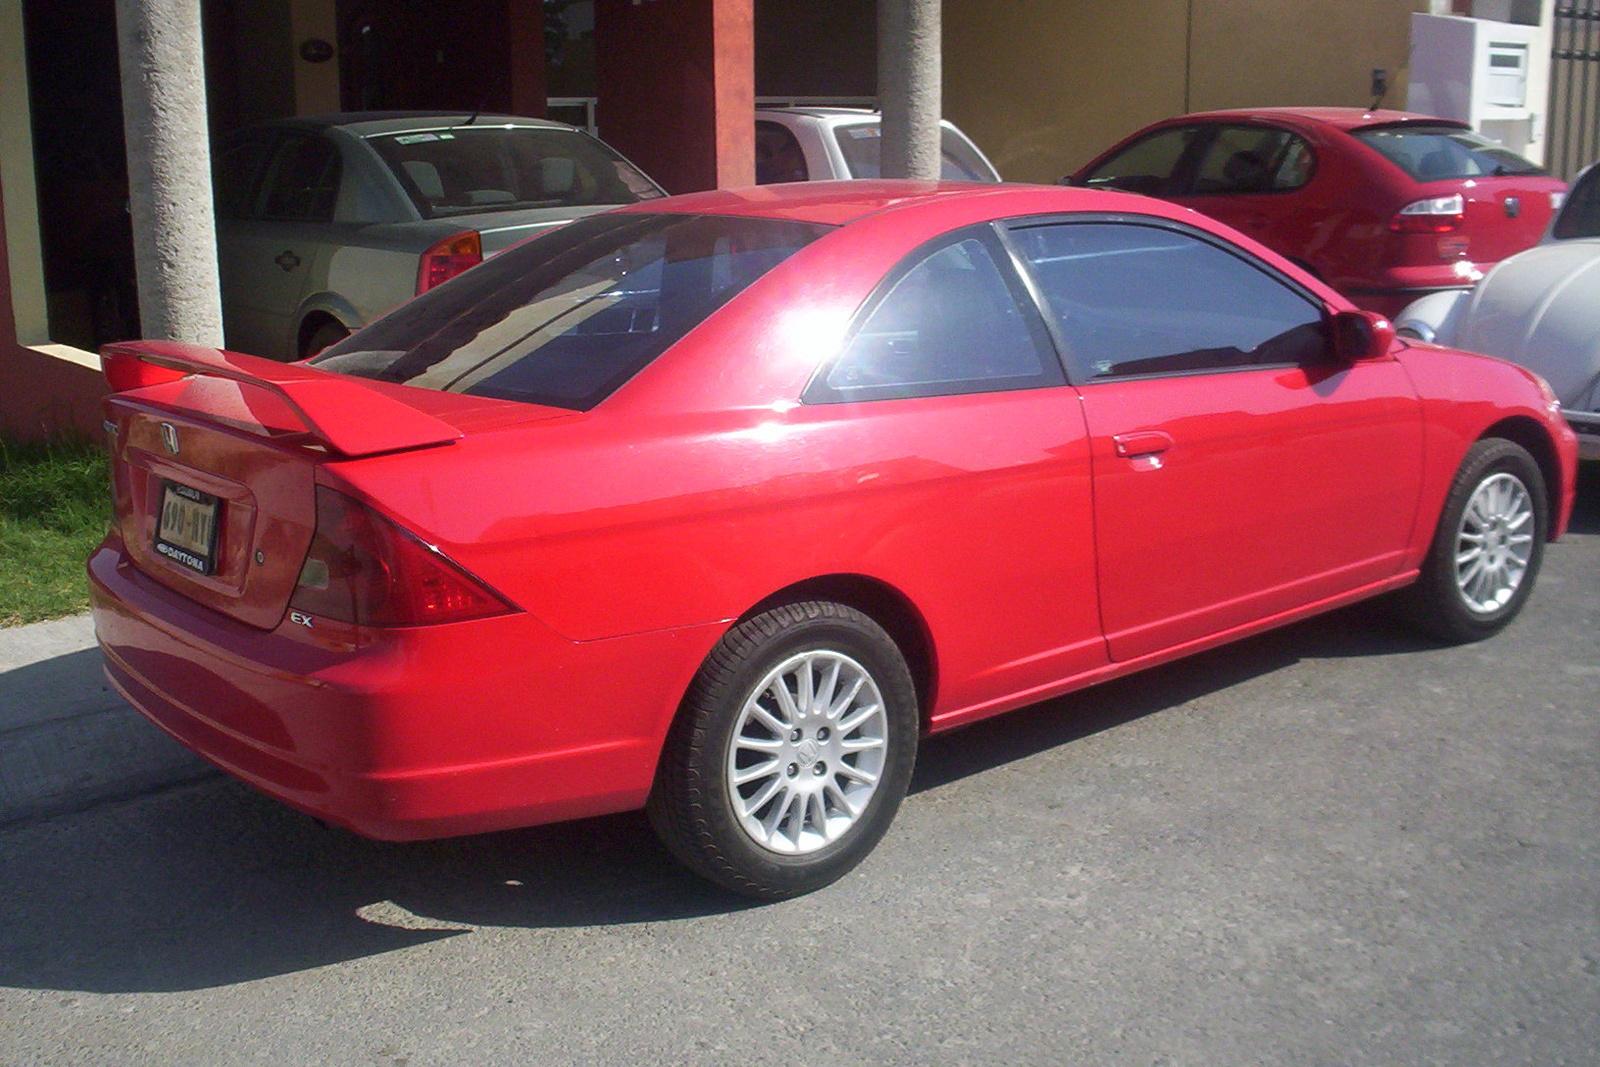 2001 honda civic coupe  | cargurus.com